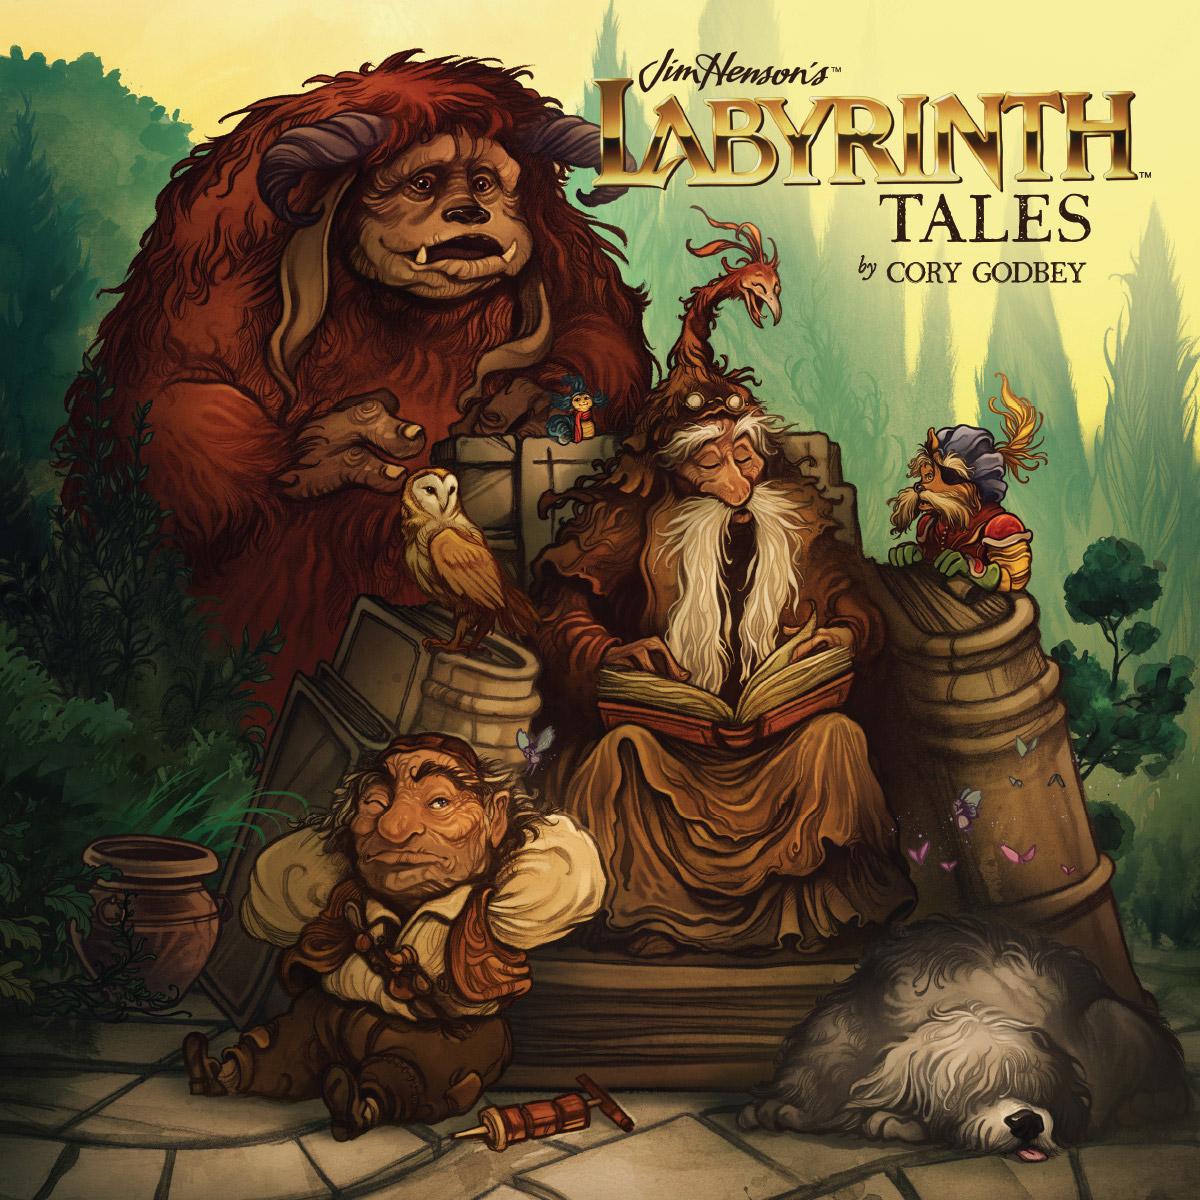 5ec1e-f20b856d472abfa0-labyrinth_tales_hc_cover